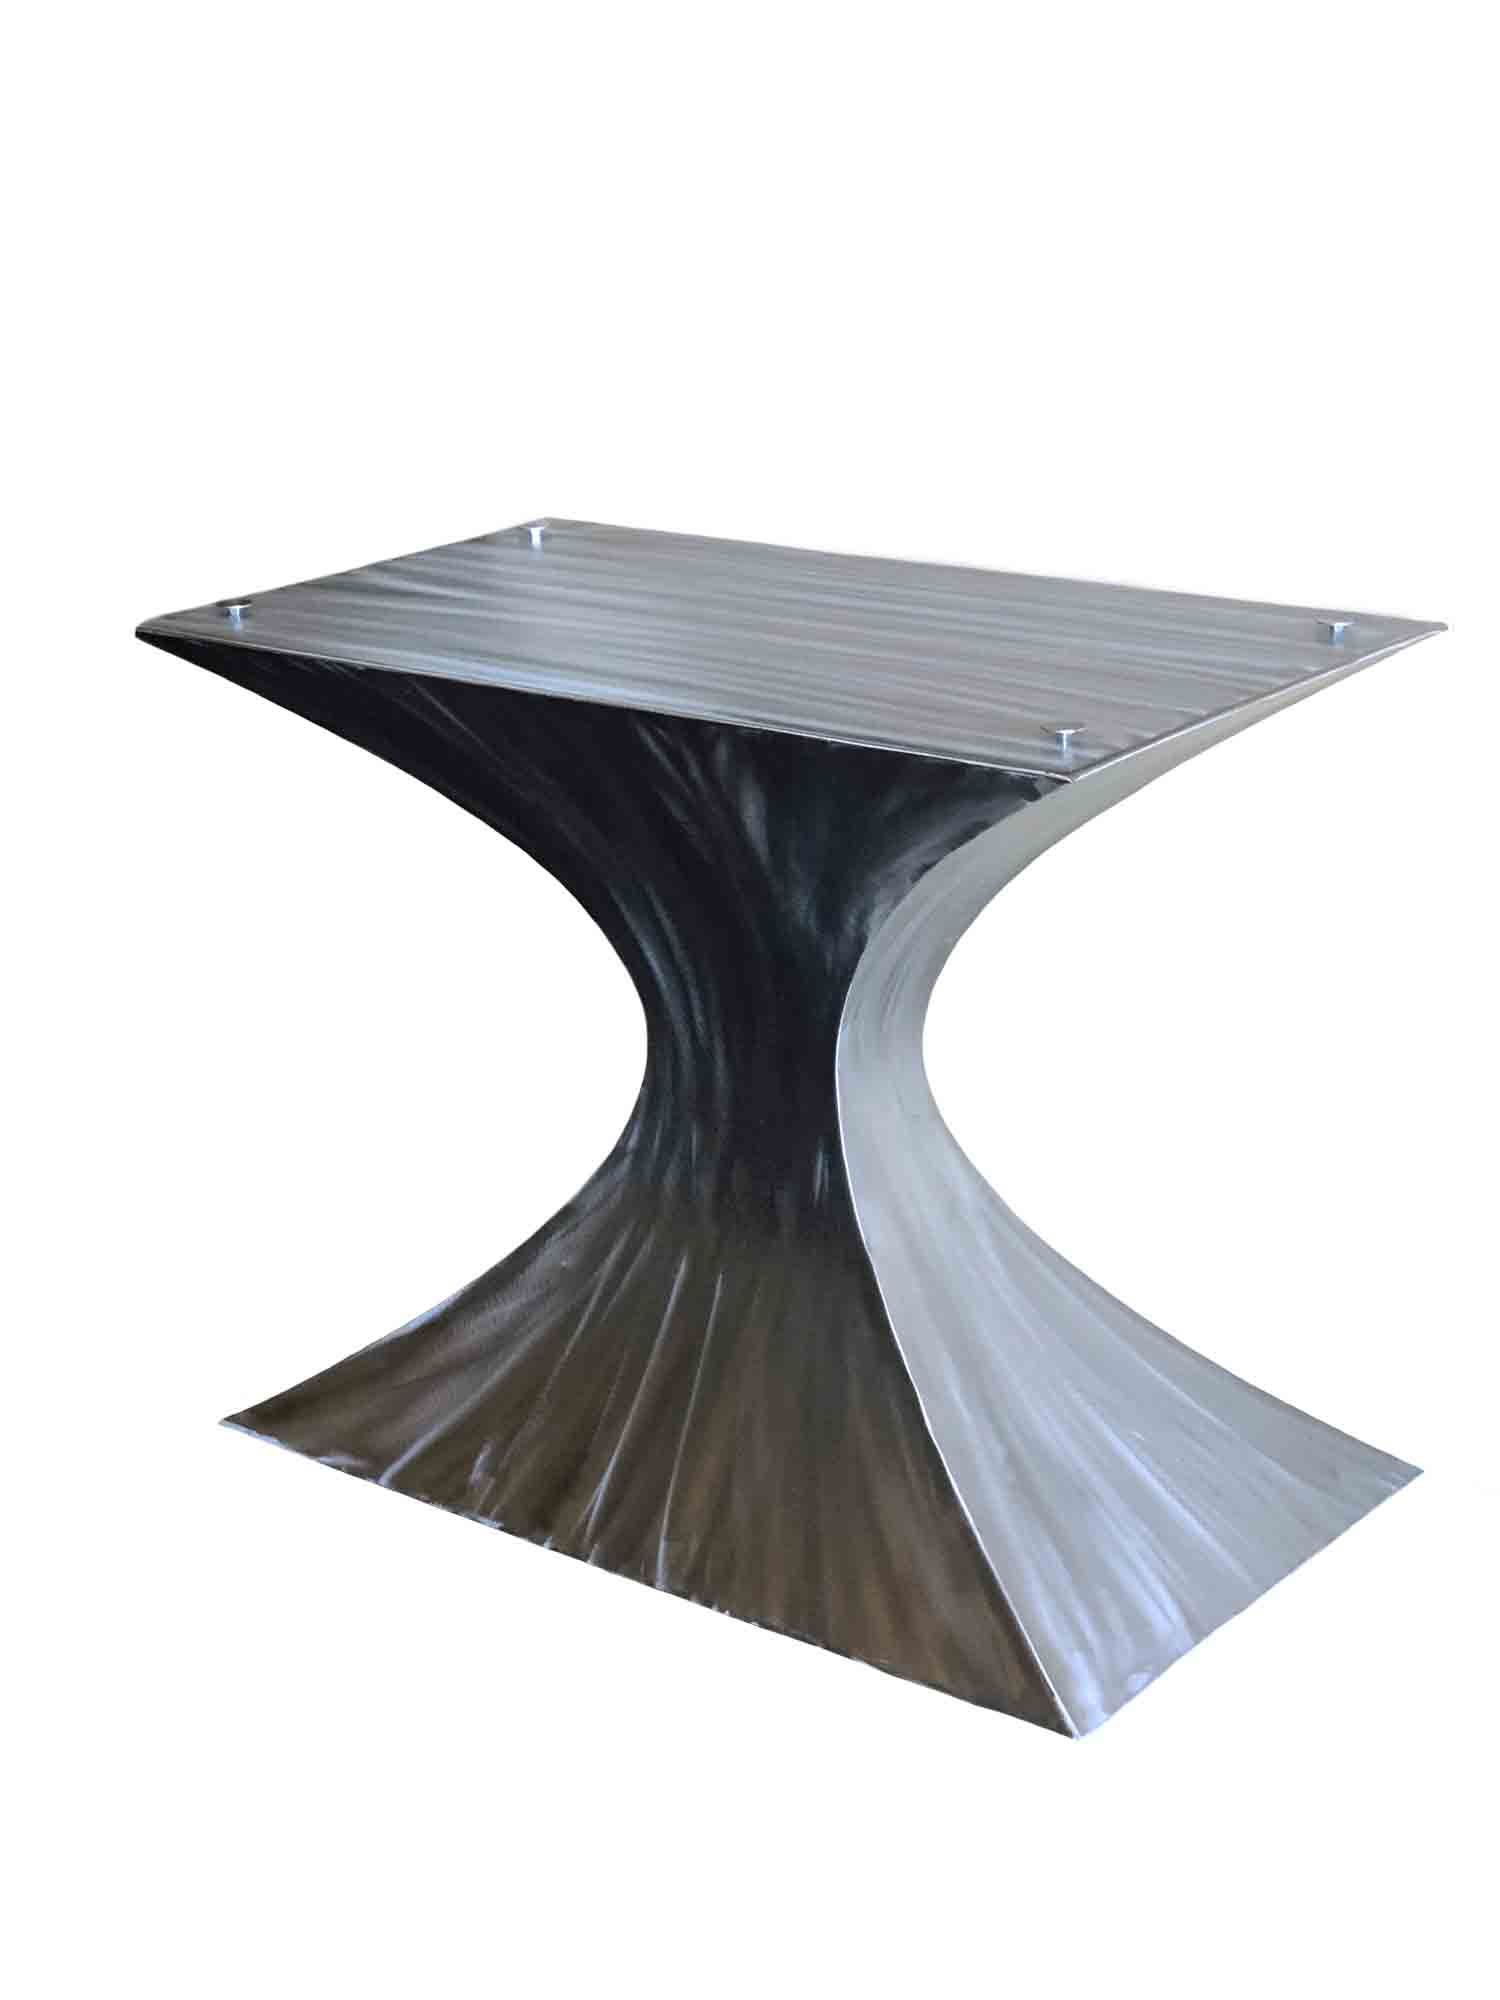 Metal Pedestal Base Hourglass Metal Table Base Metal Table Entryway Tables